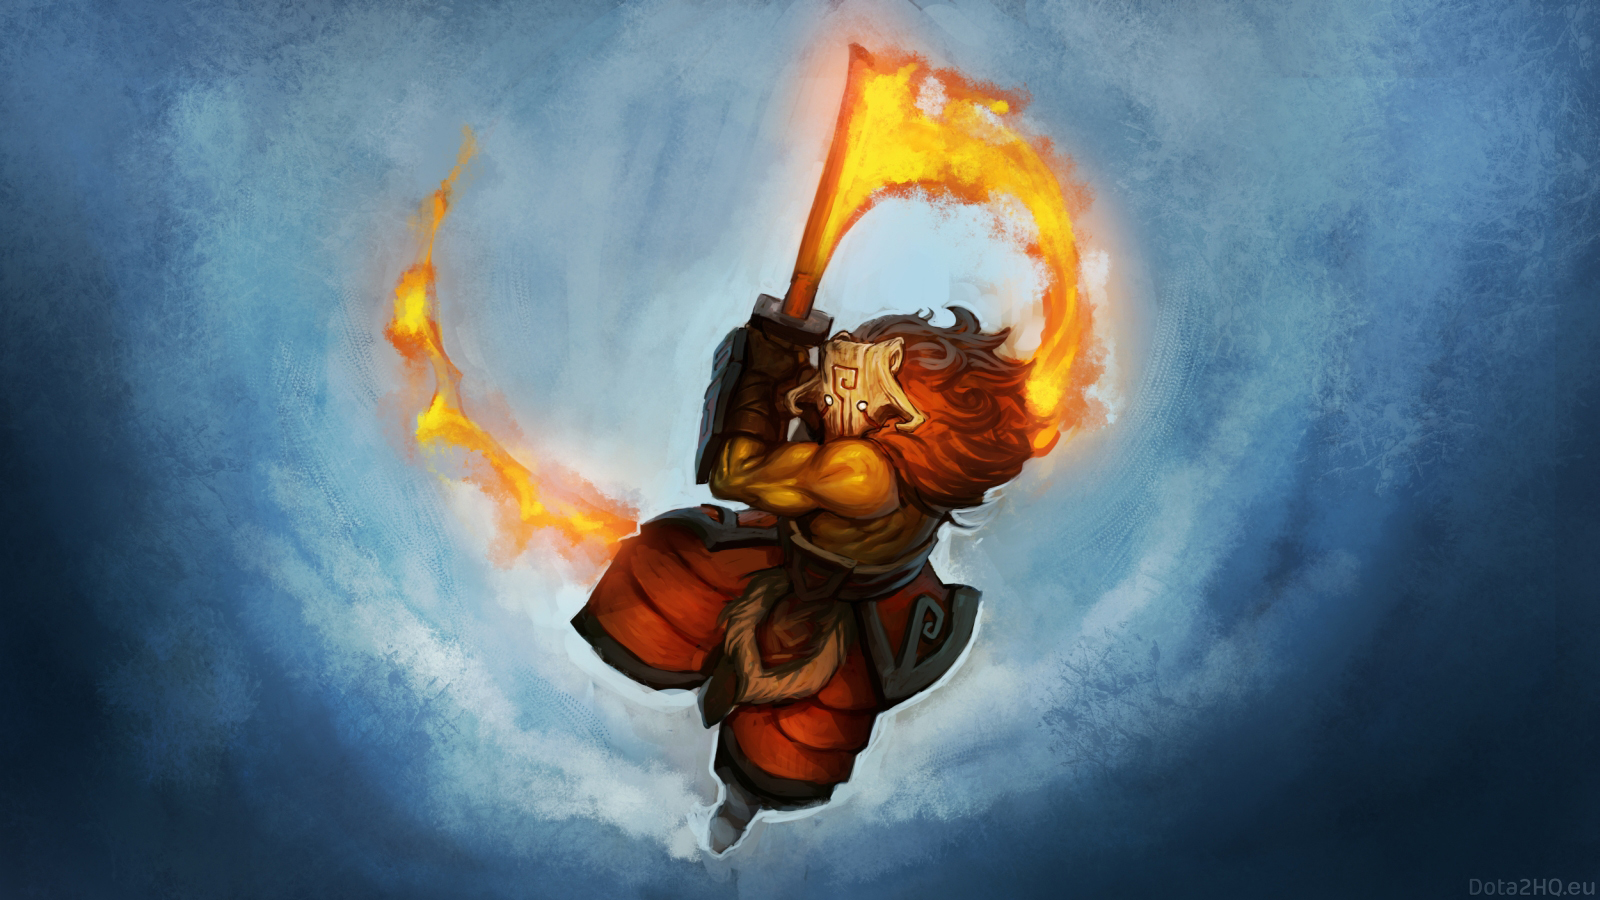 Yurnero The Juggernaut Wallpaper - Best Juggernaut Dota 2 , HD Wallpaper & Backgrounds